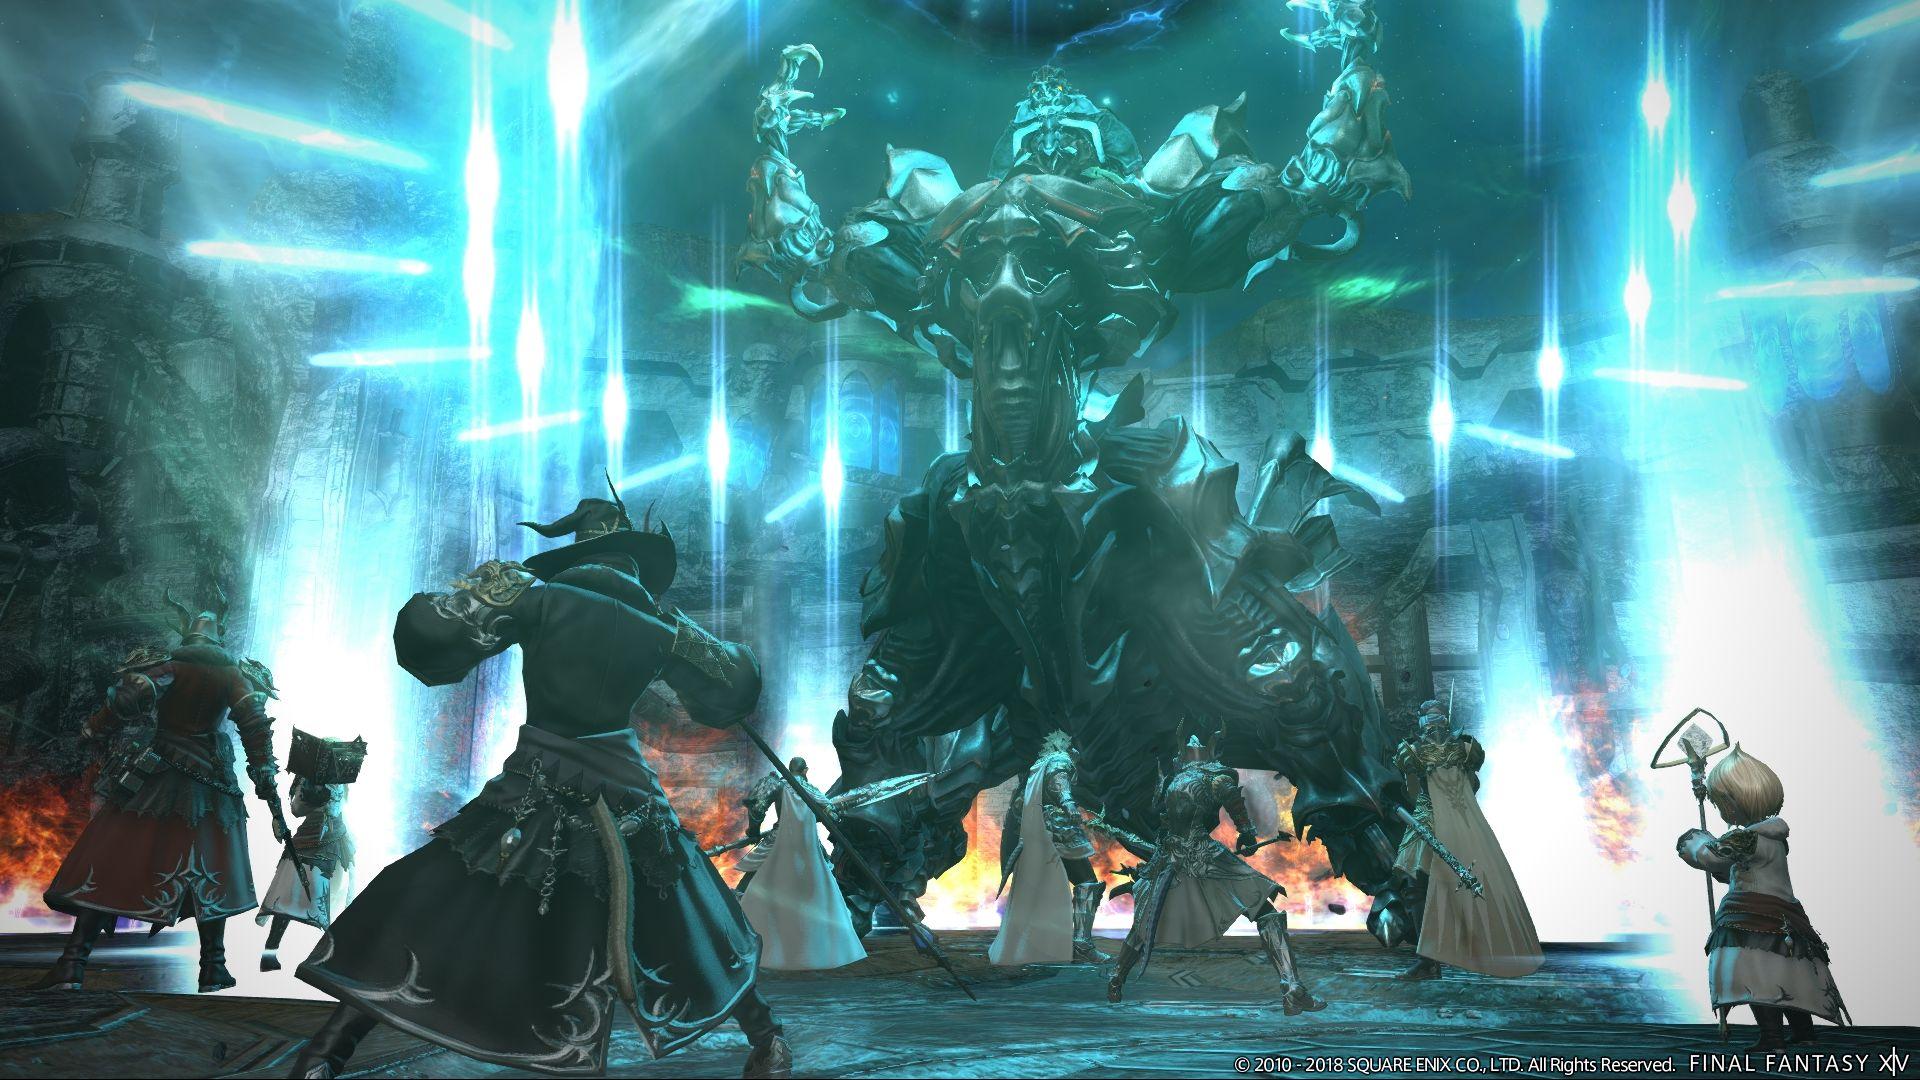 Neue Final Fantasy Xiv Screenshots Zu Patch 43 Zeigen Den Neuen